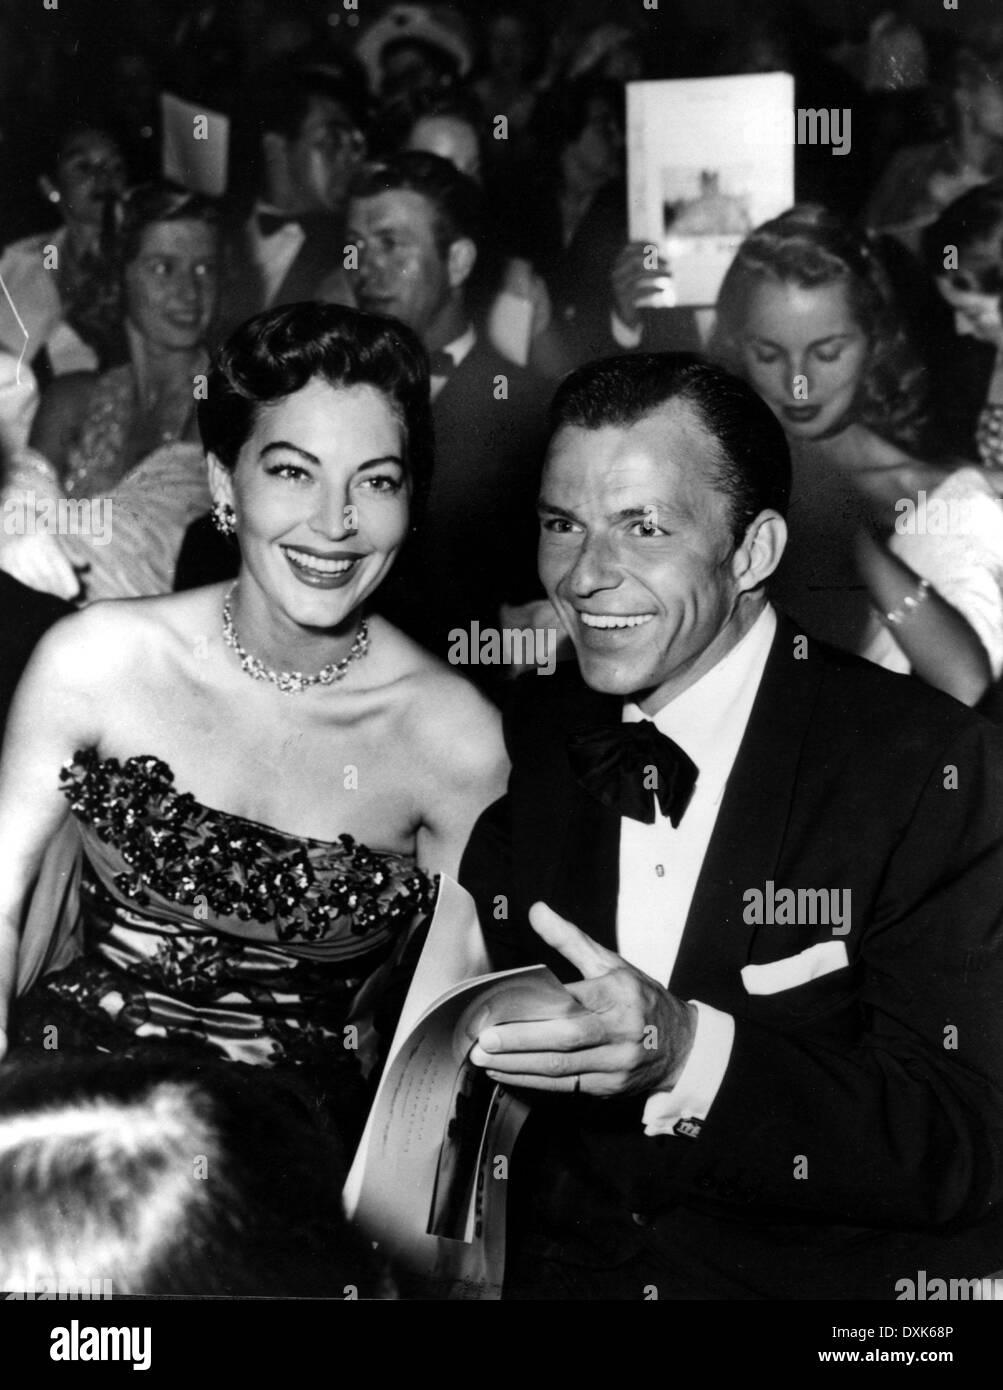 SHOW BOAT (1951) AVA GARDNER ET FRANK SINATRA À LA PREM ... Ava Gardner 1989